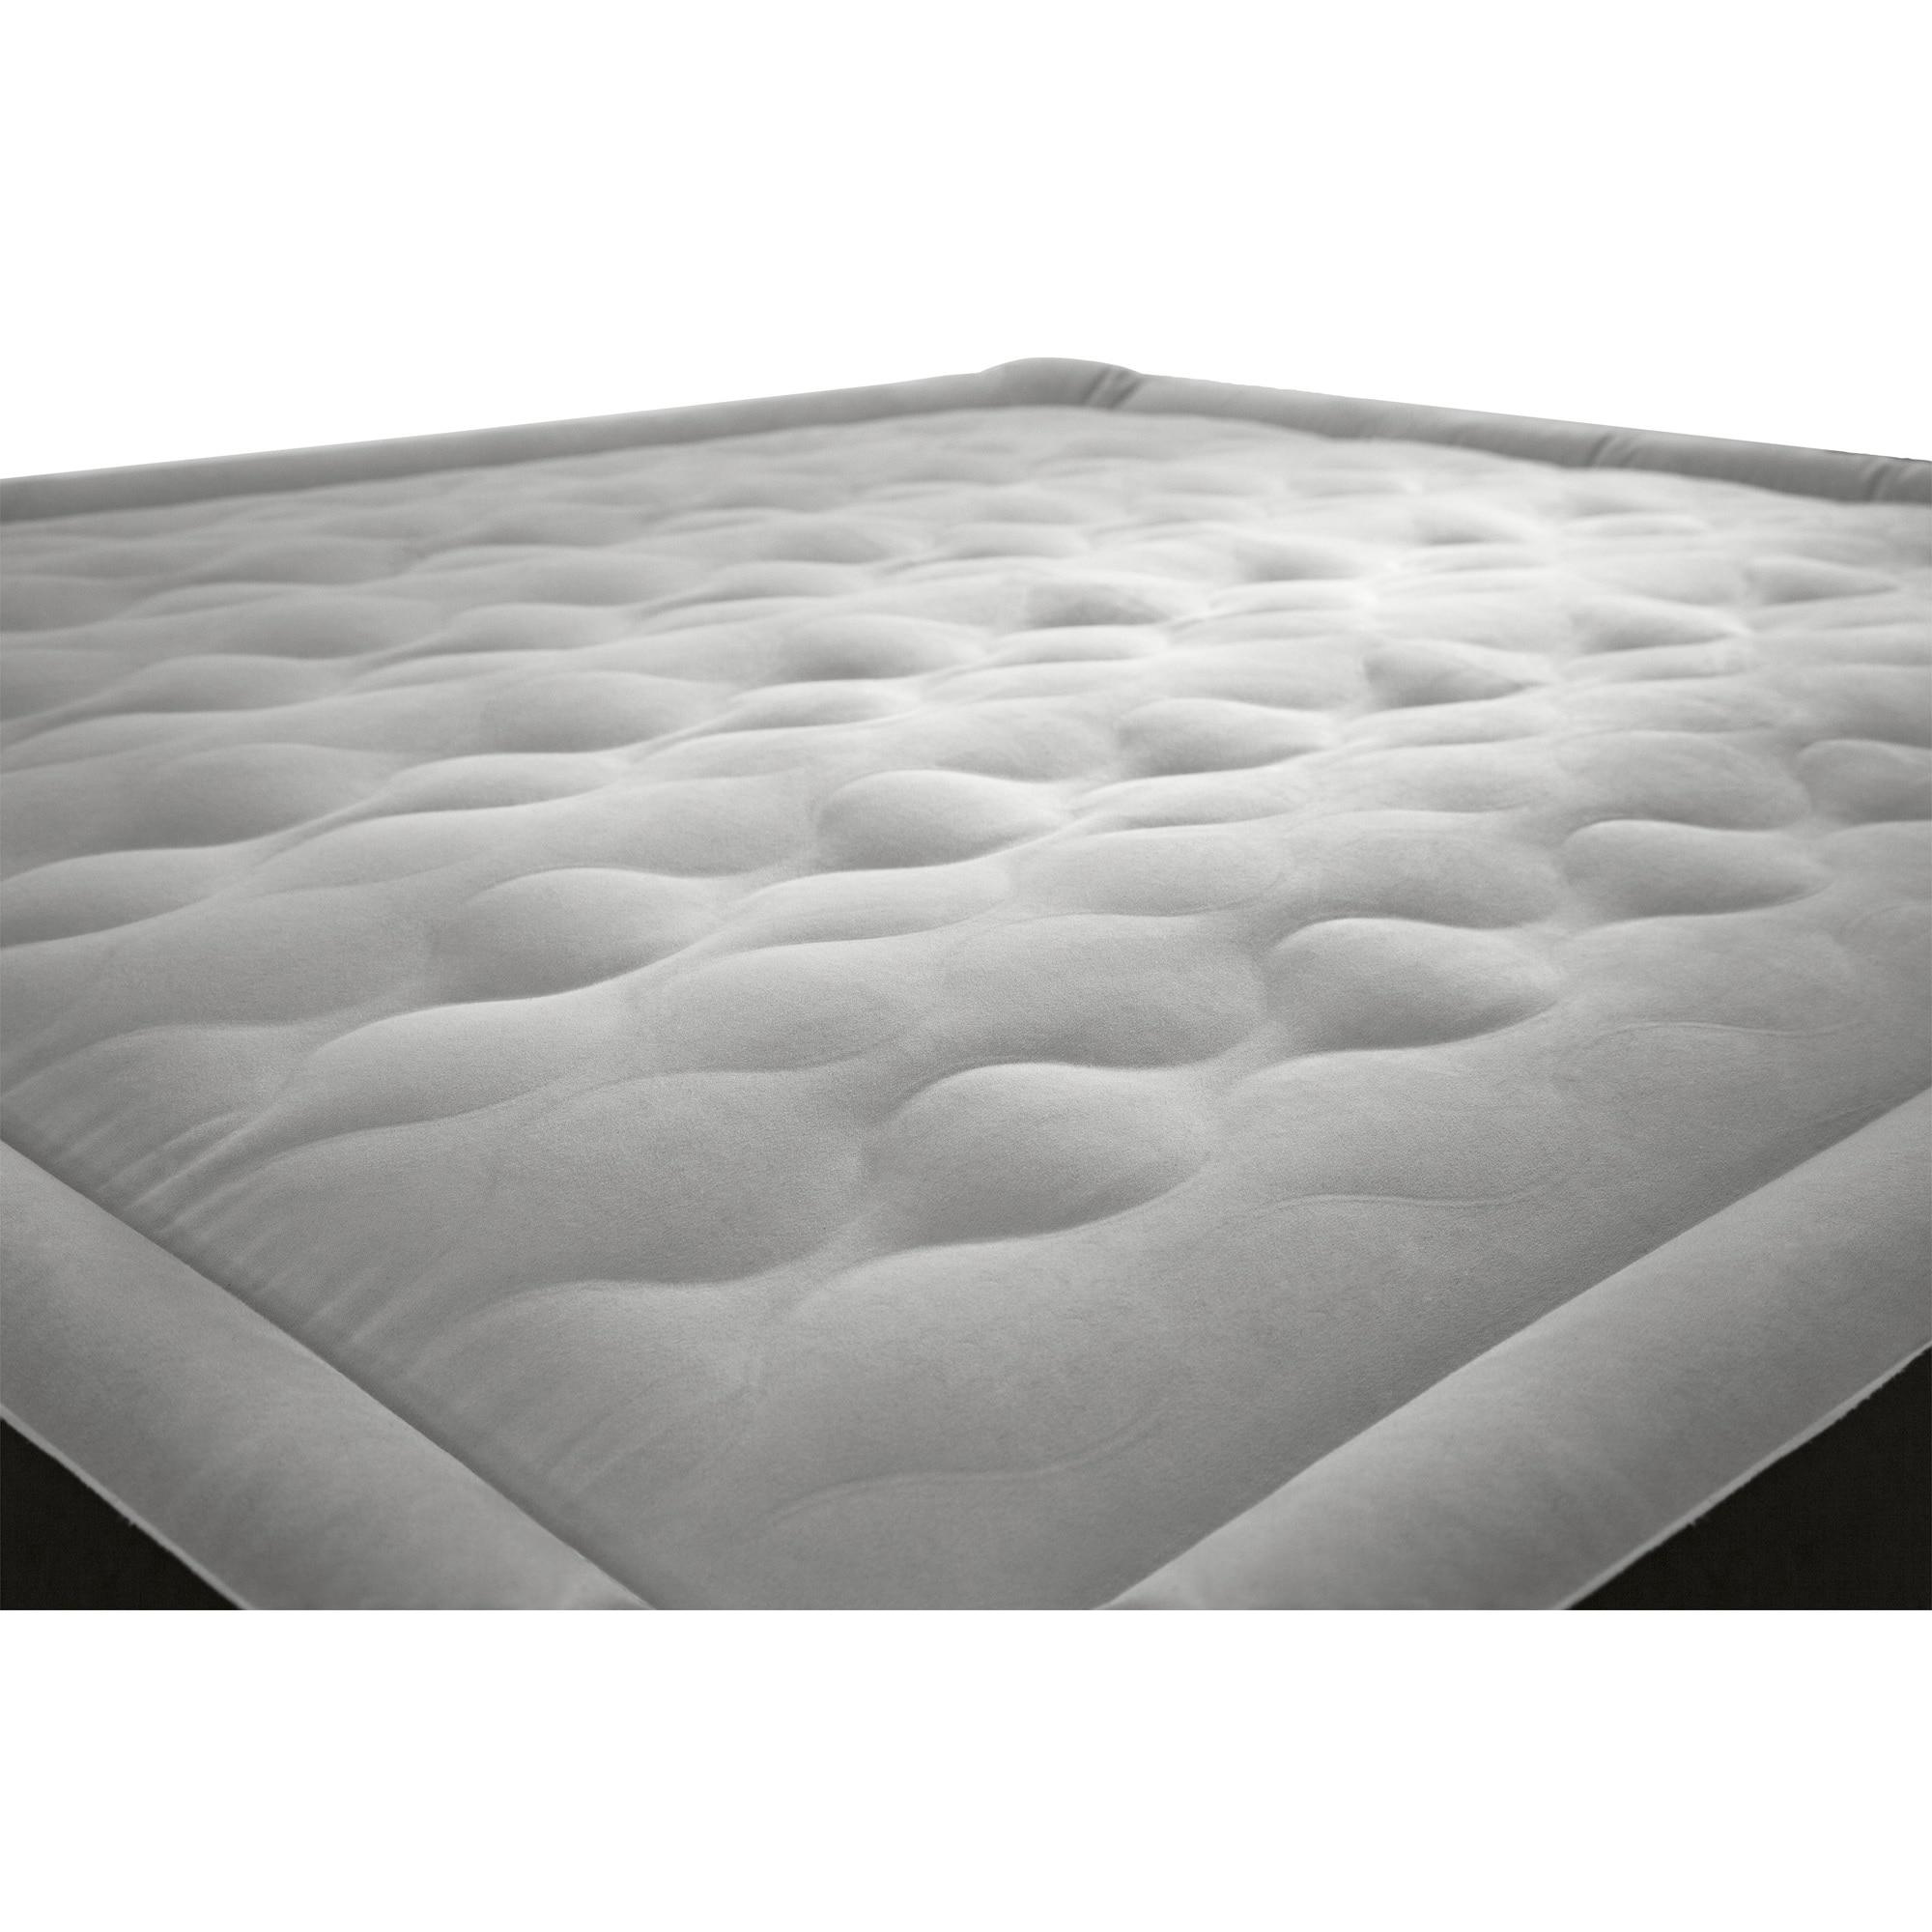 mattress air silentnight square ebay airmax itm topper main